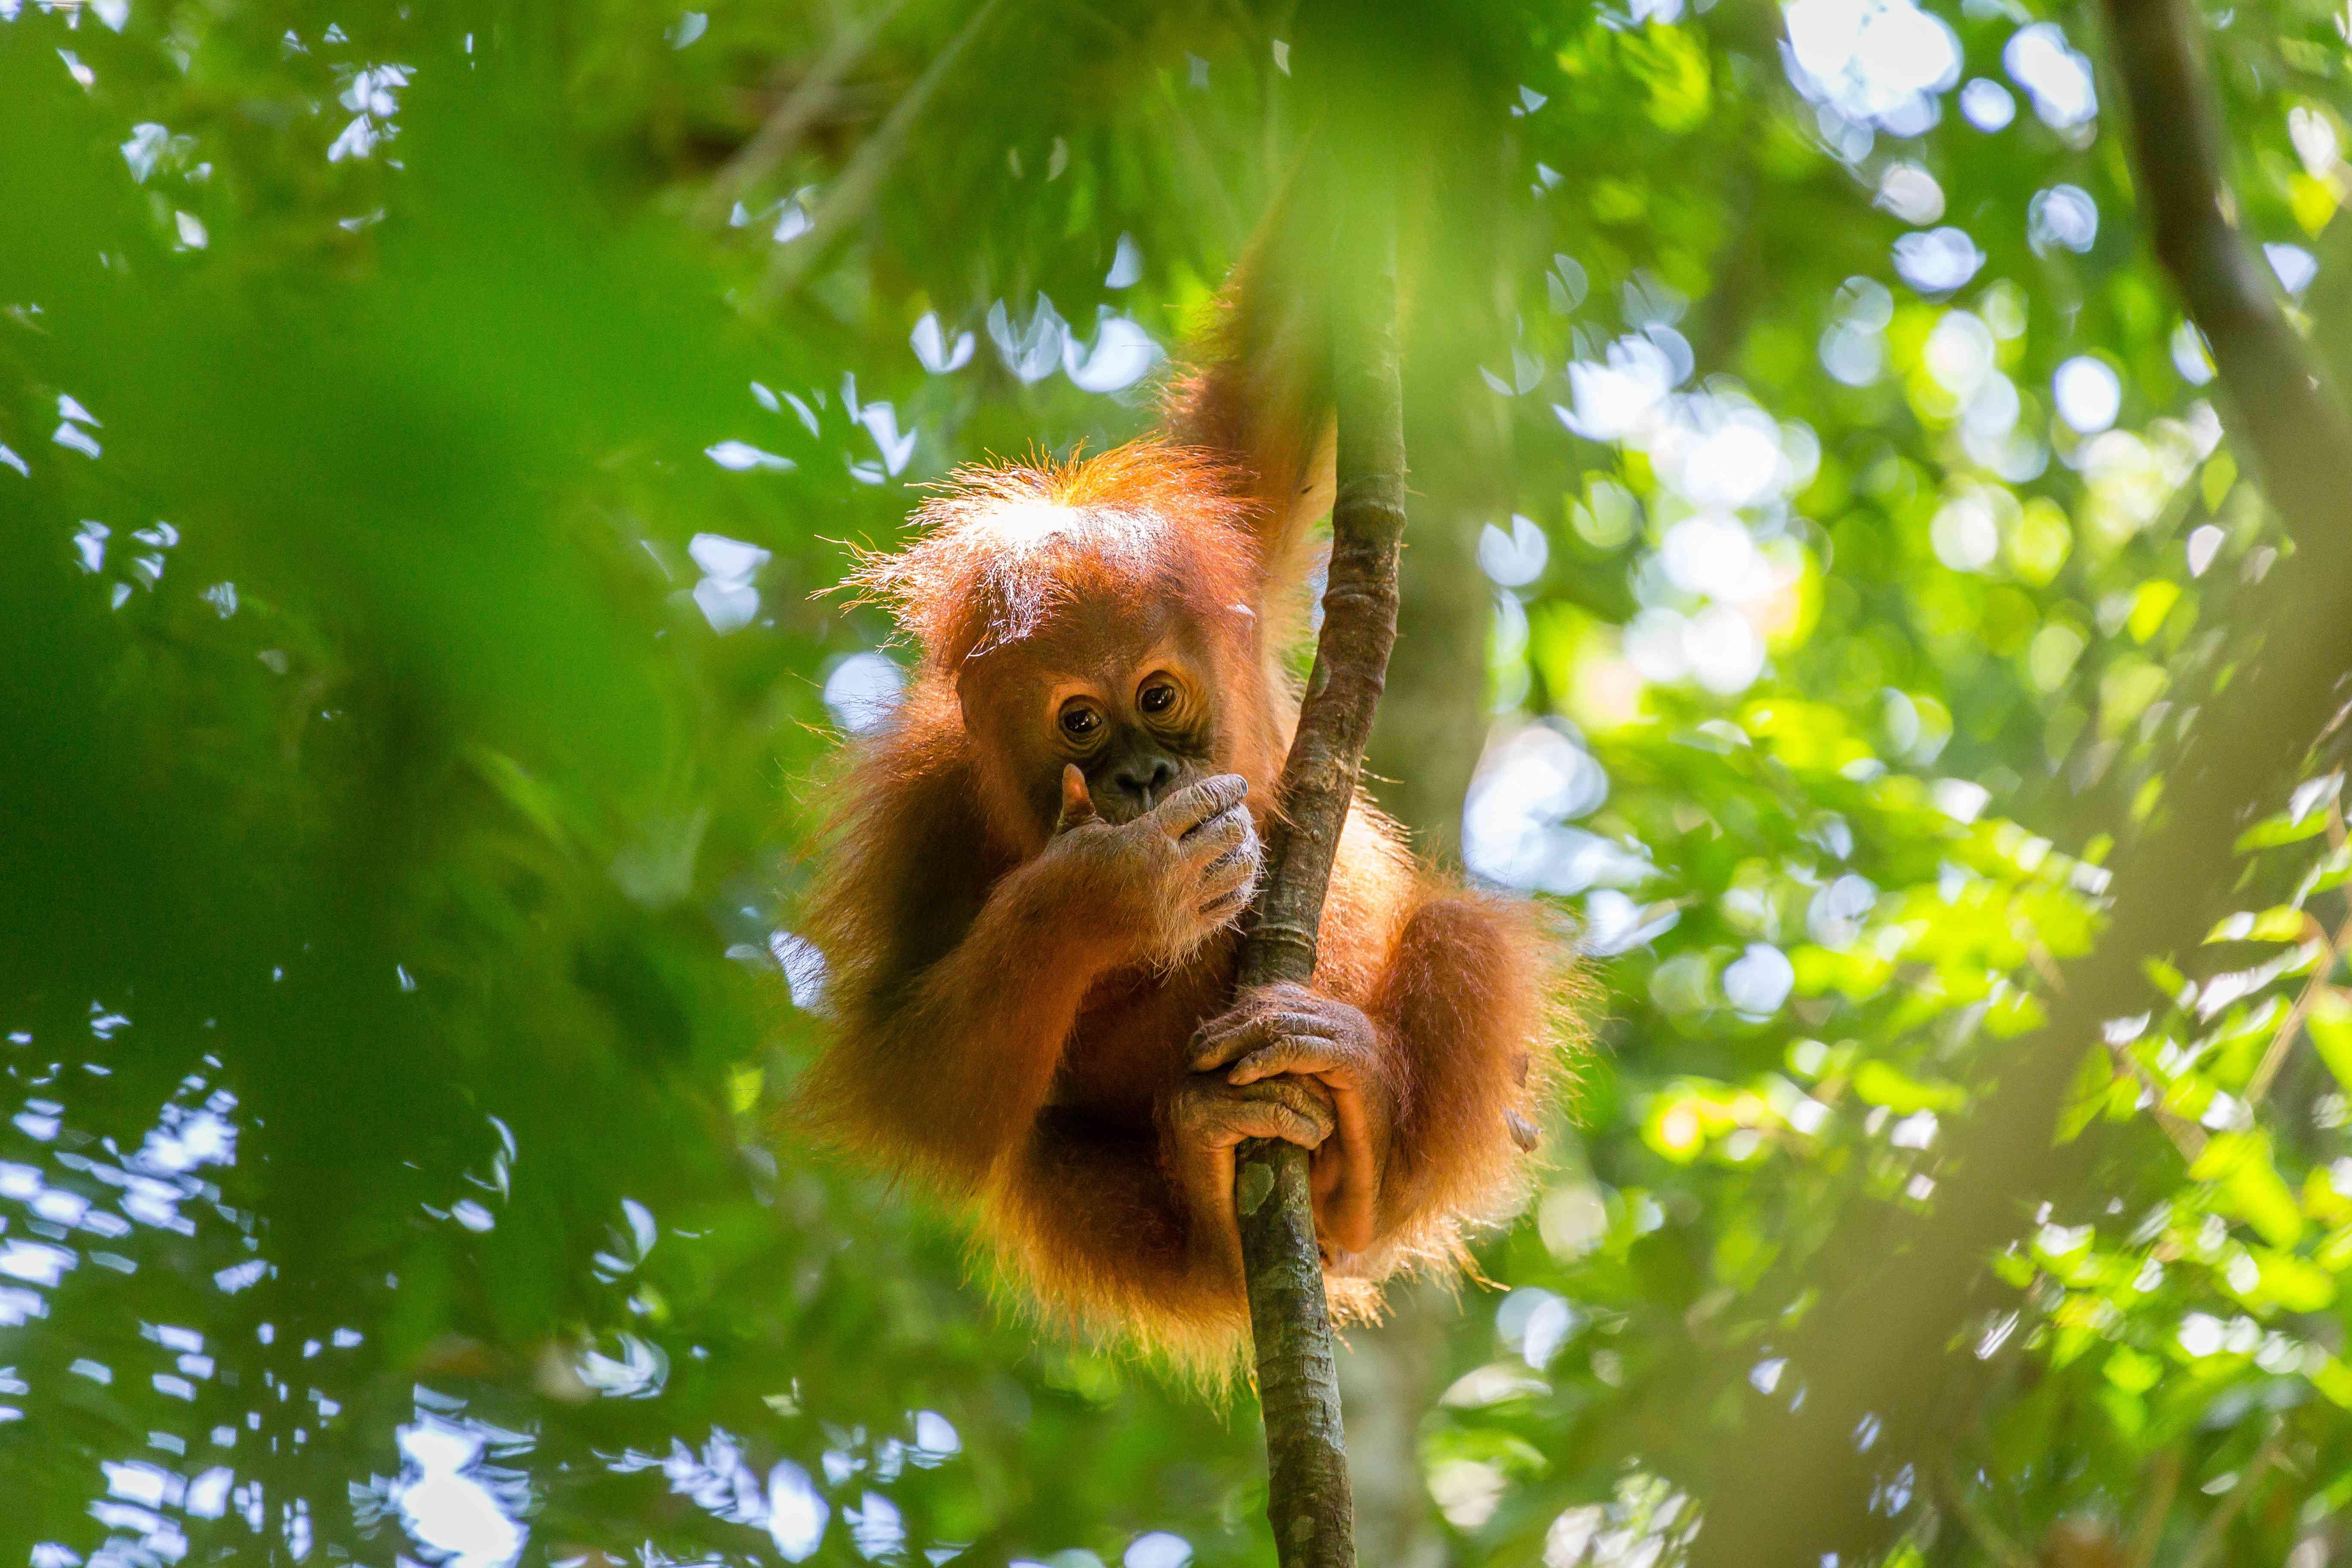 A baby orangutan in Sumatra, Indonesia